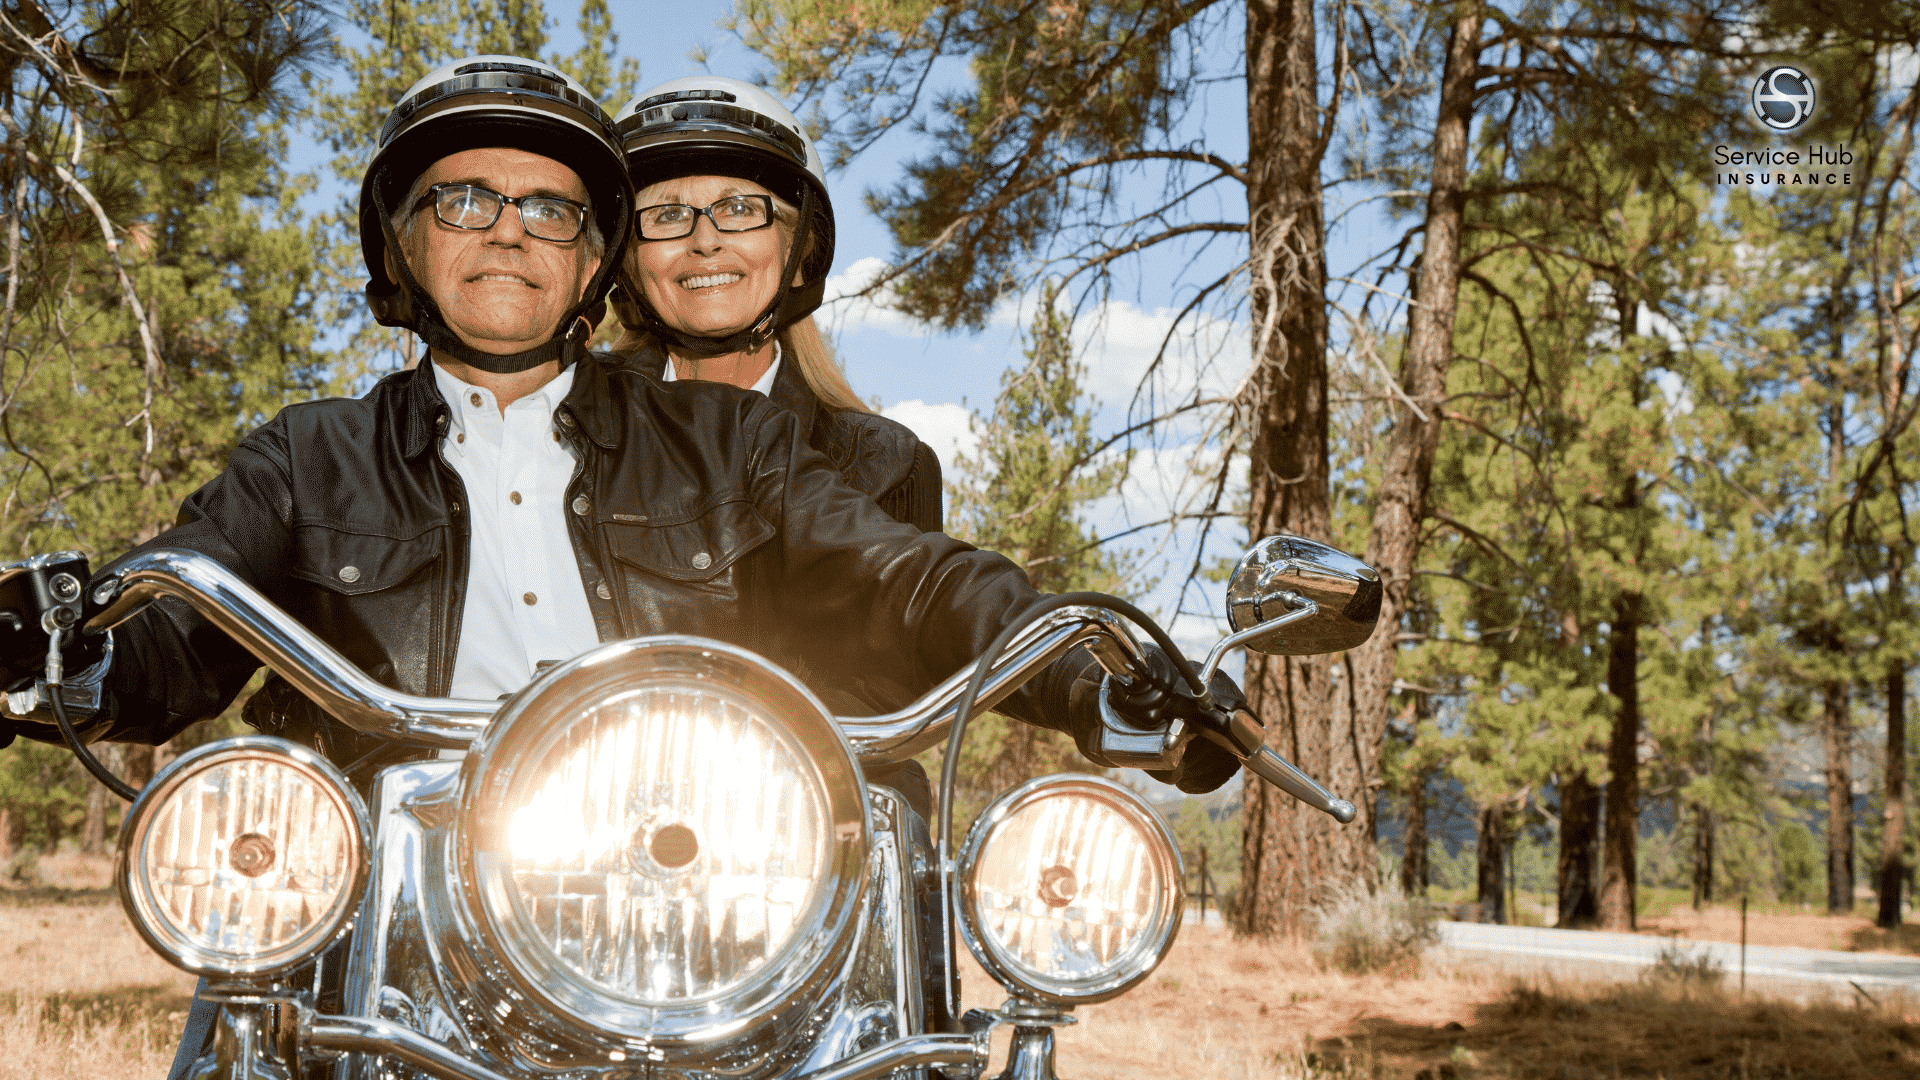 Motorcycle Insurance - Service Hub Insurance